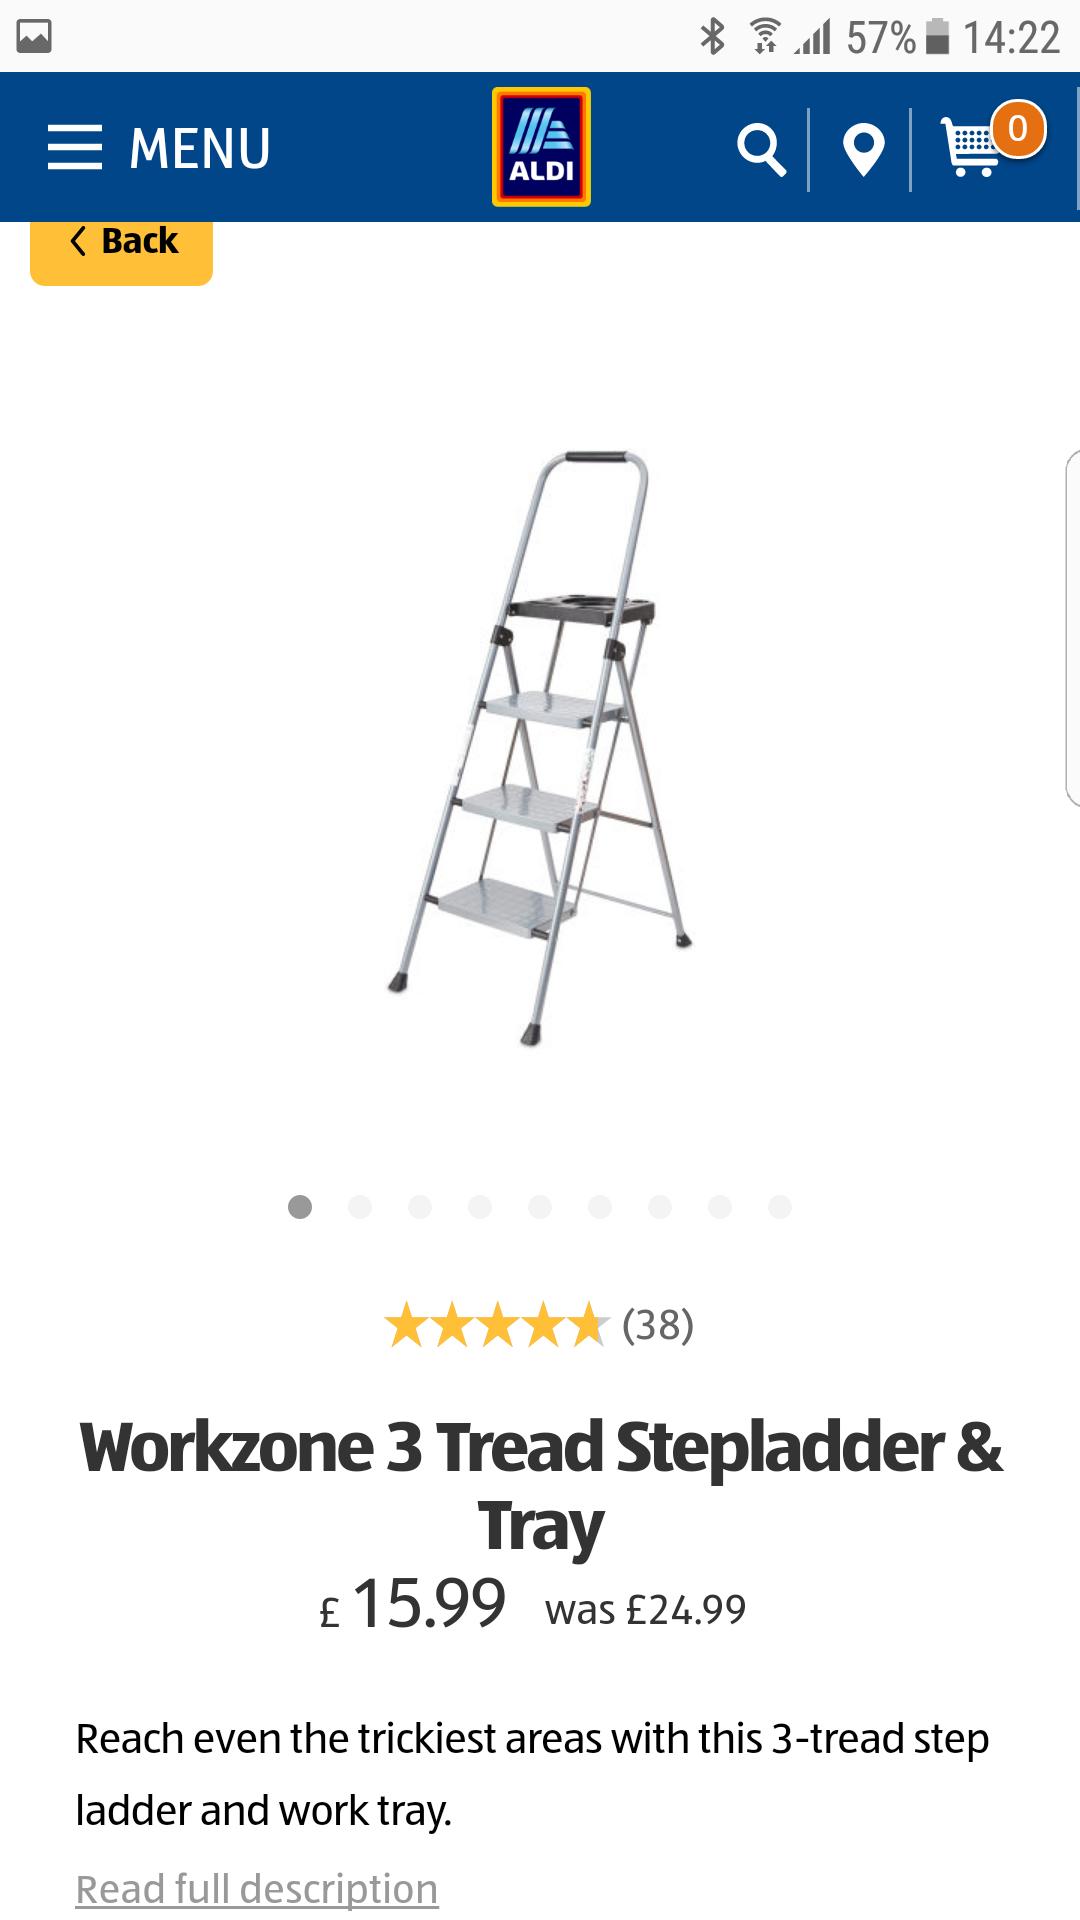 (38) Workzone 3 Tread Stepladder & Tray £15.99 @ Aldi